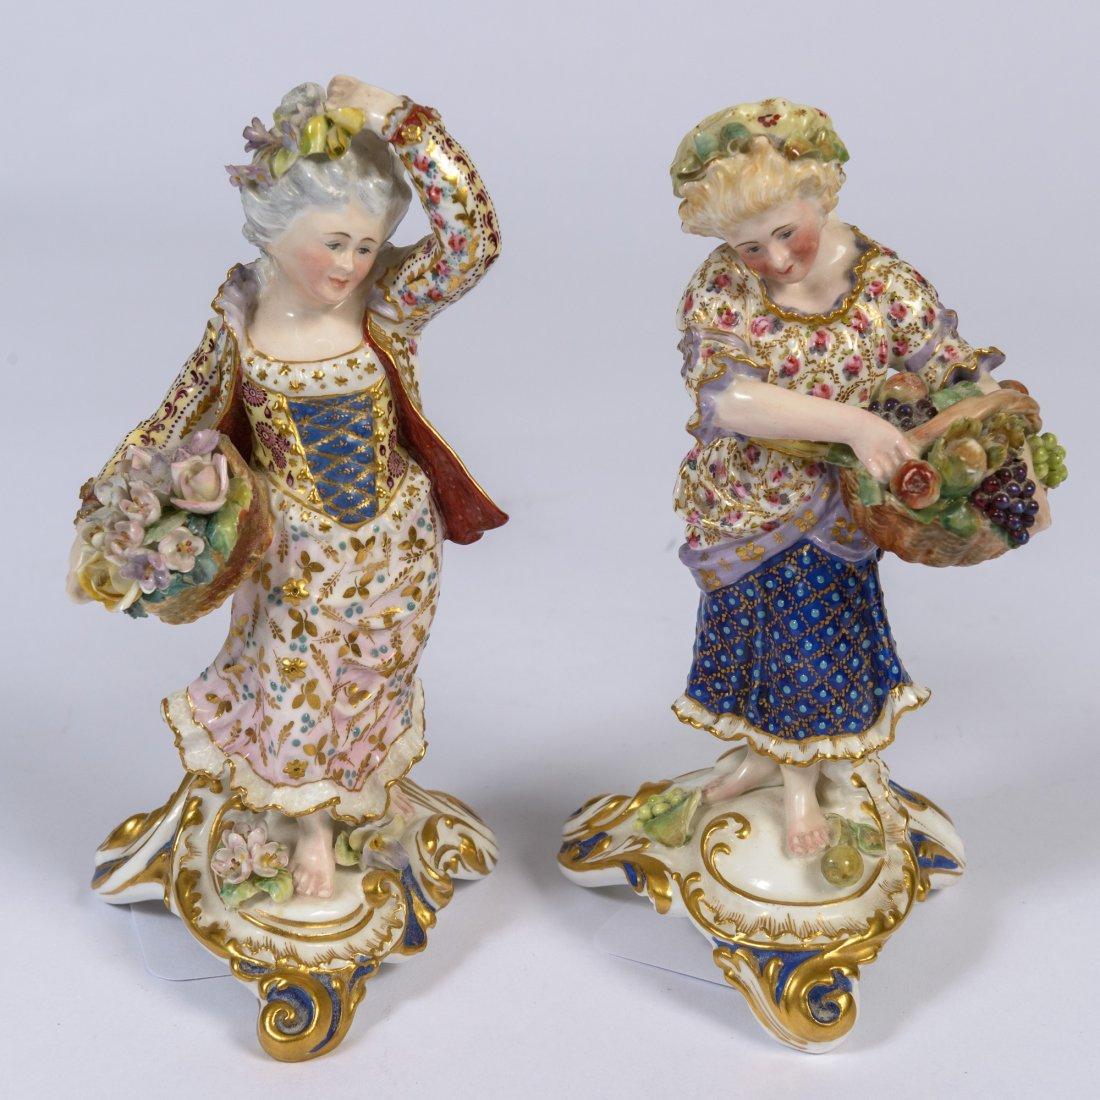 A Pair of Royal Crown Derby Porcelain Figures,